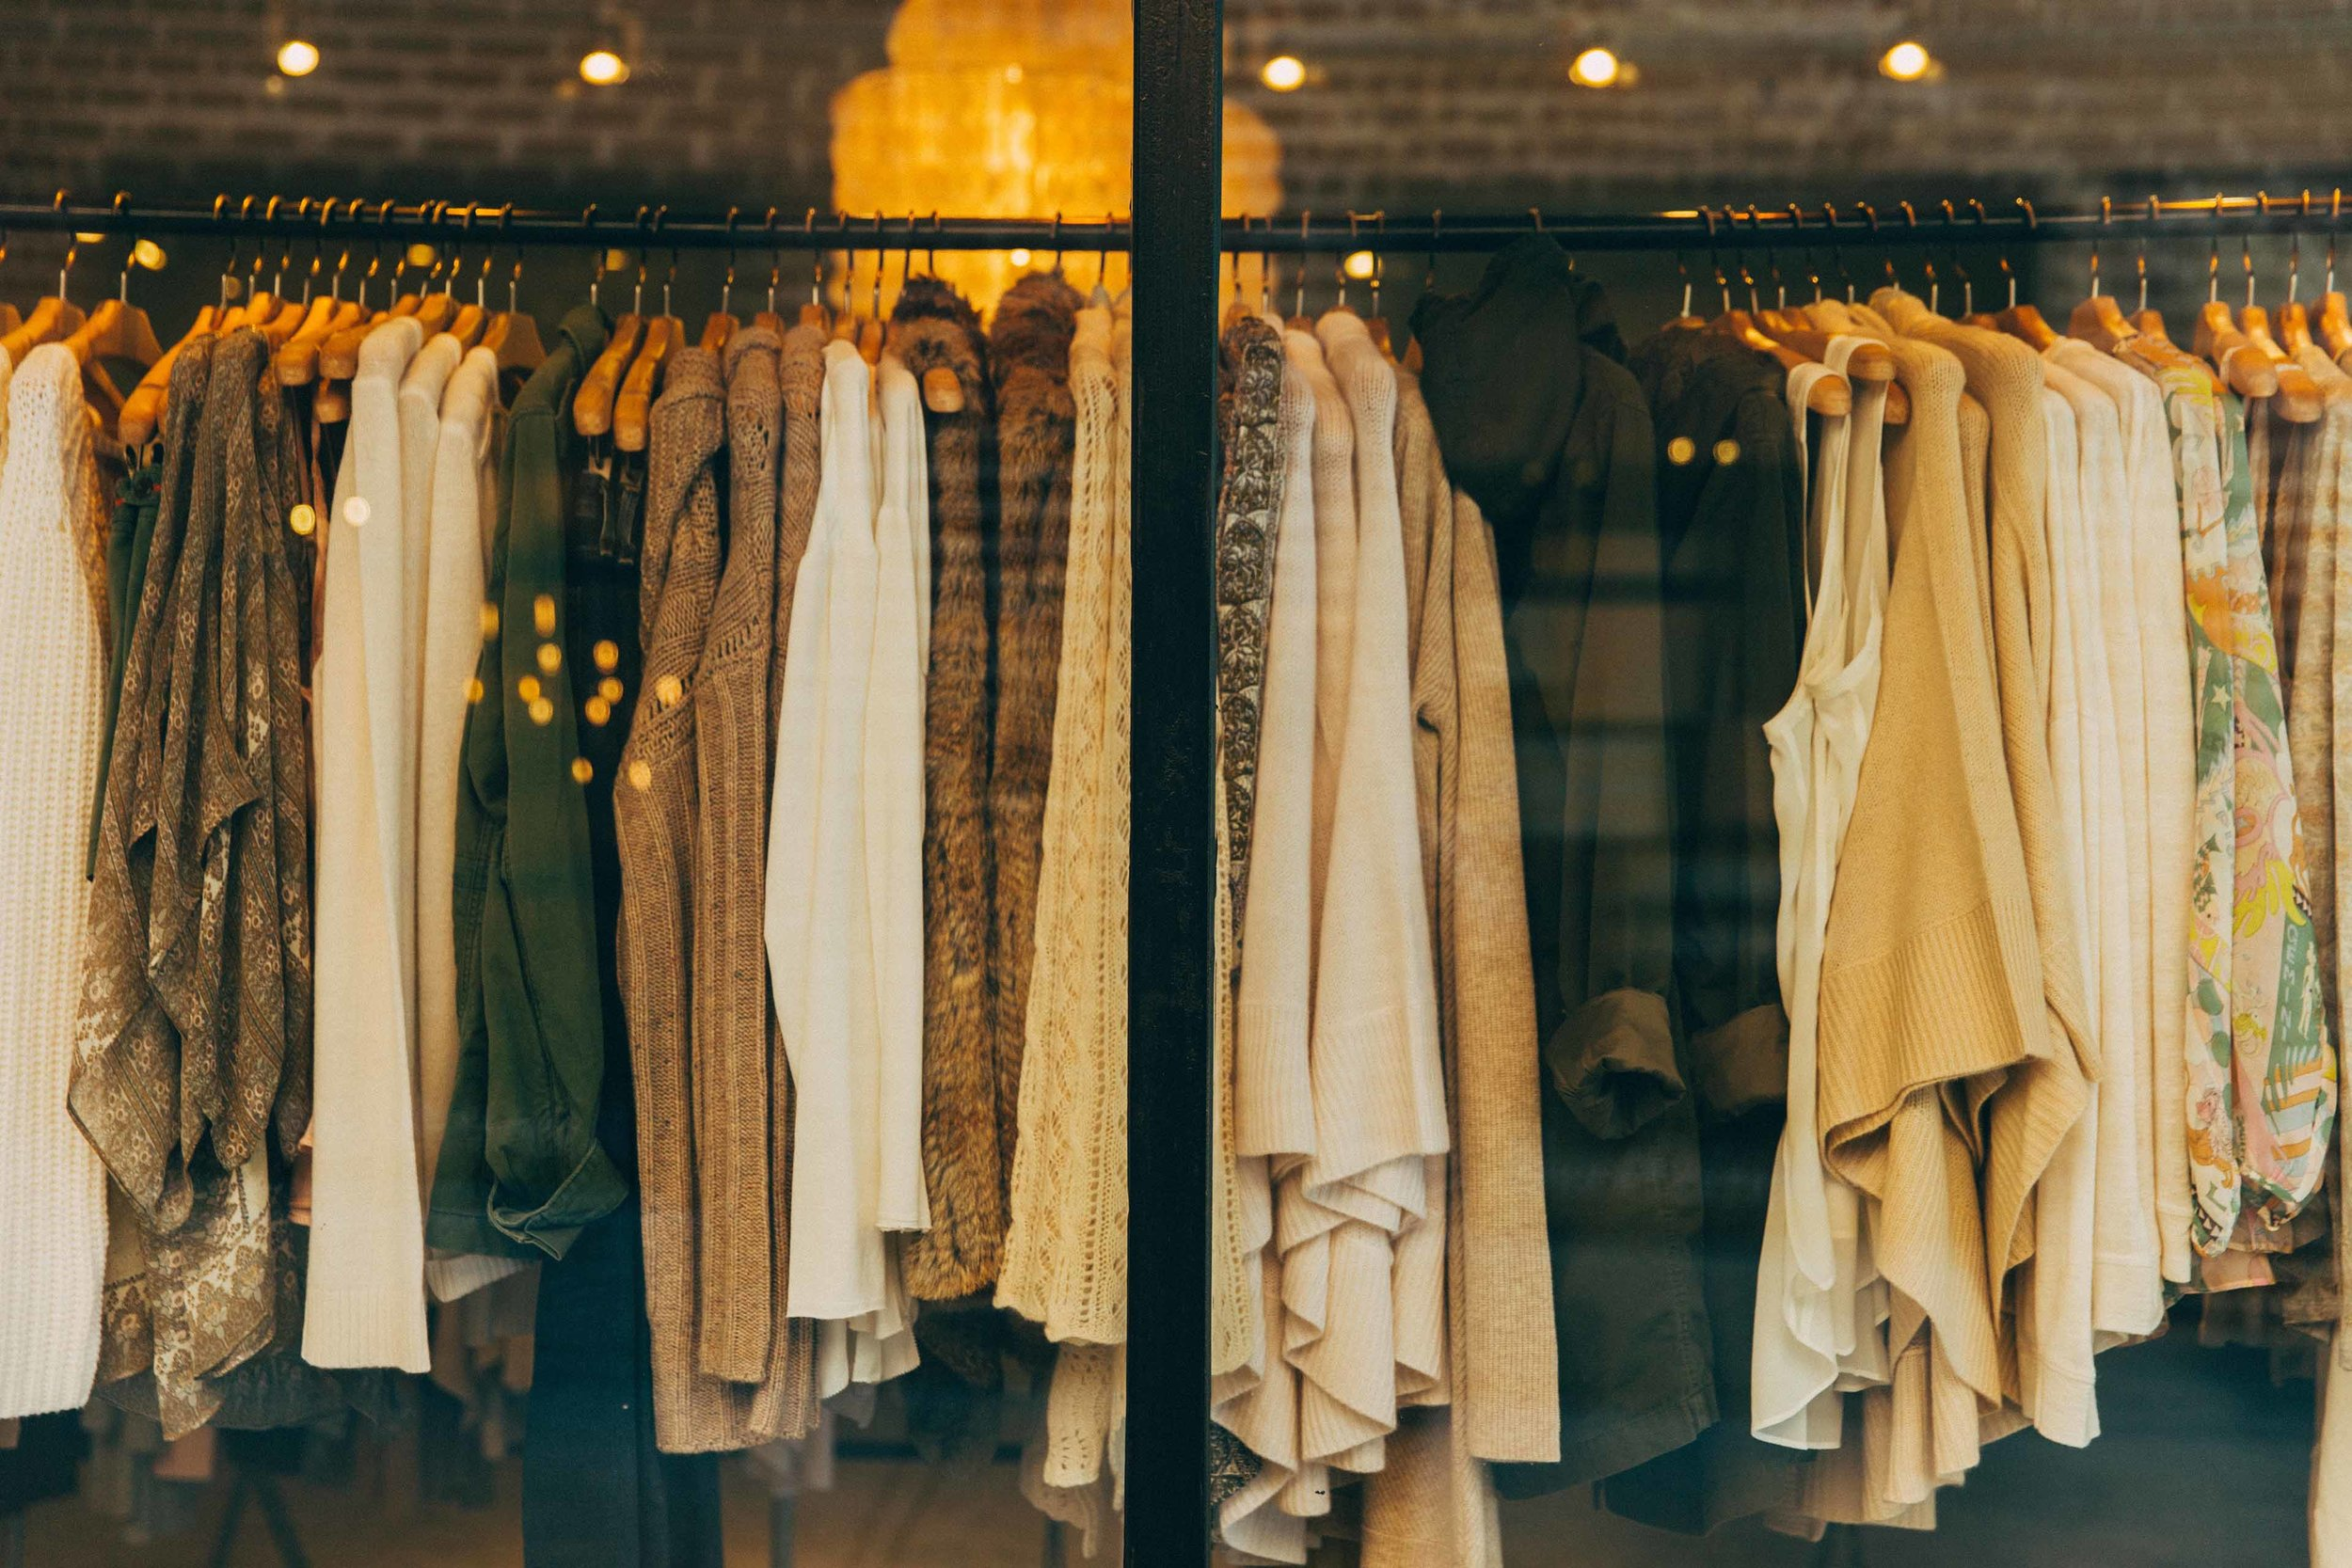 clothesresized.jpg